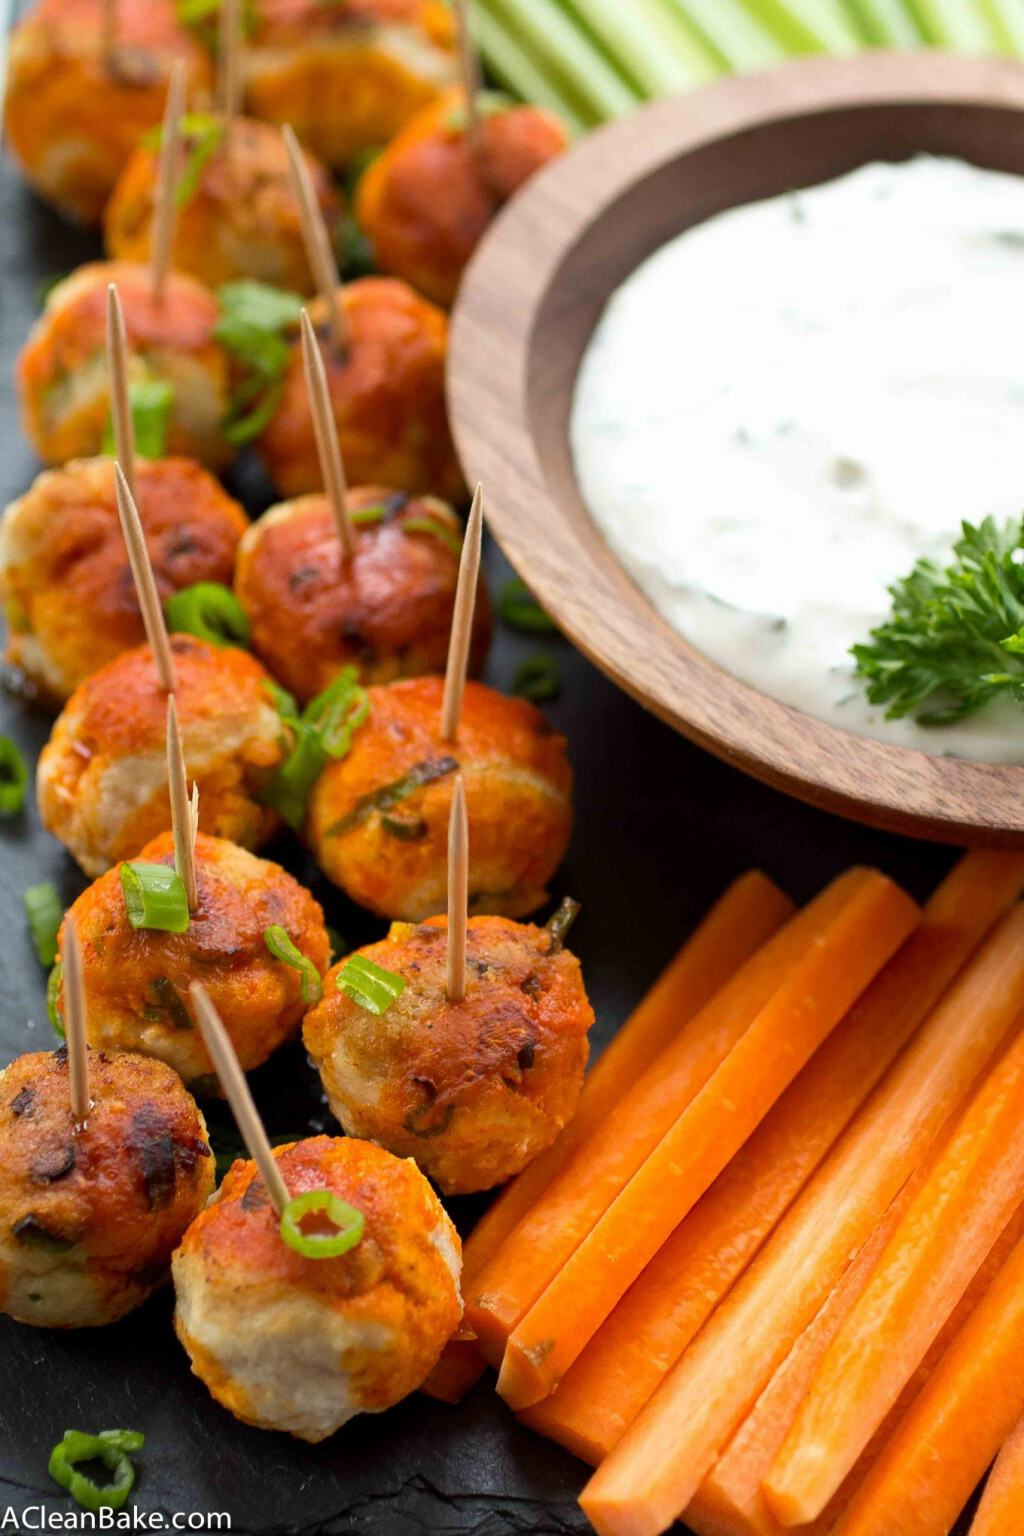 Buffalo Chicken Meatballs (Gluten Free and Paleo)